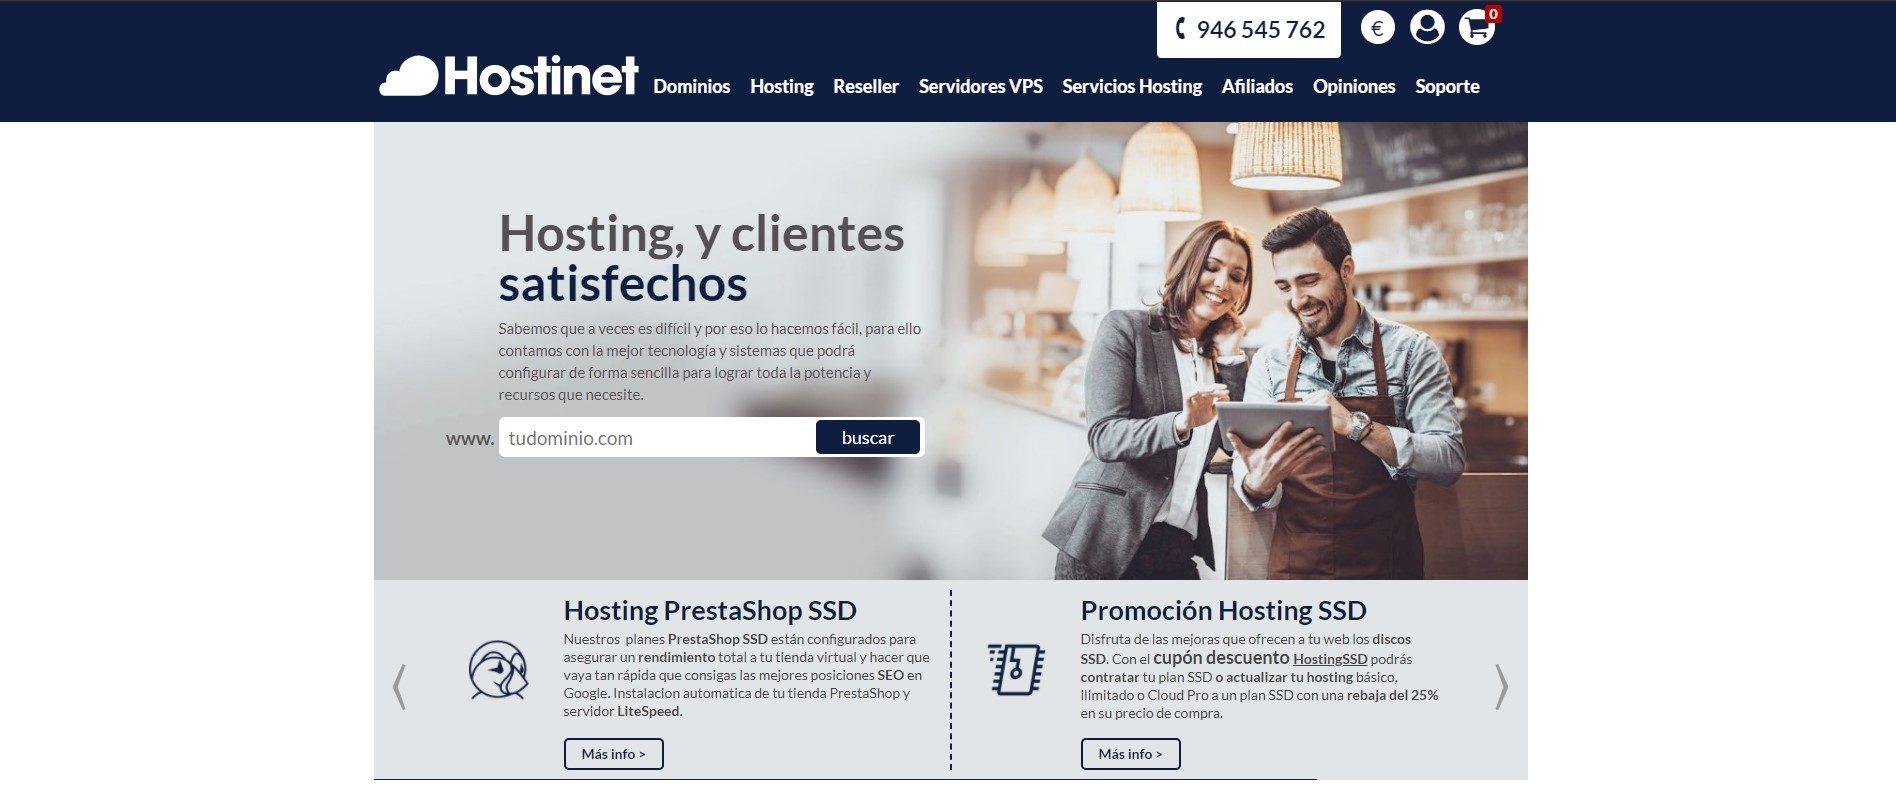 Hostinet web